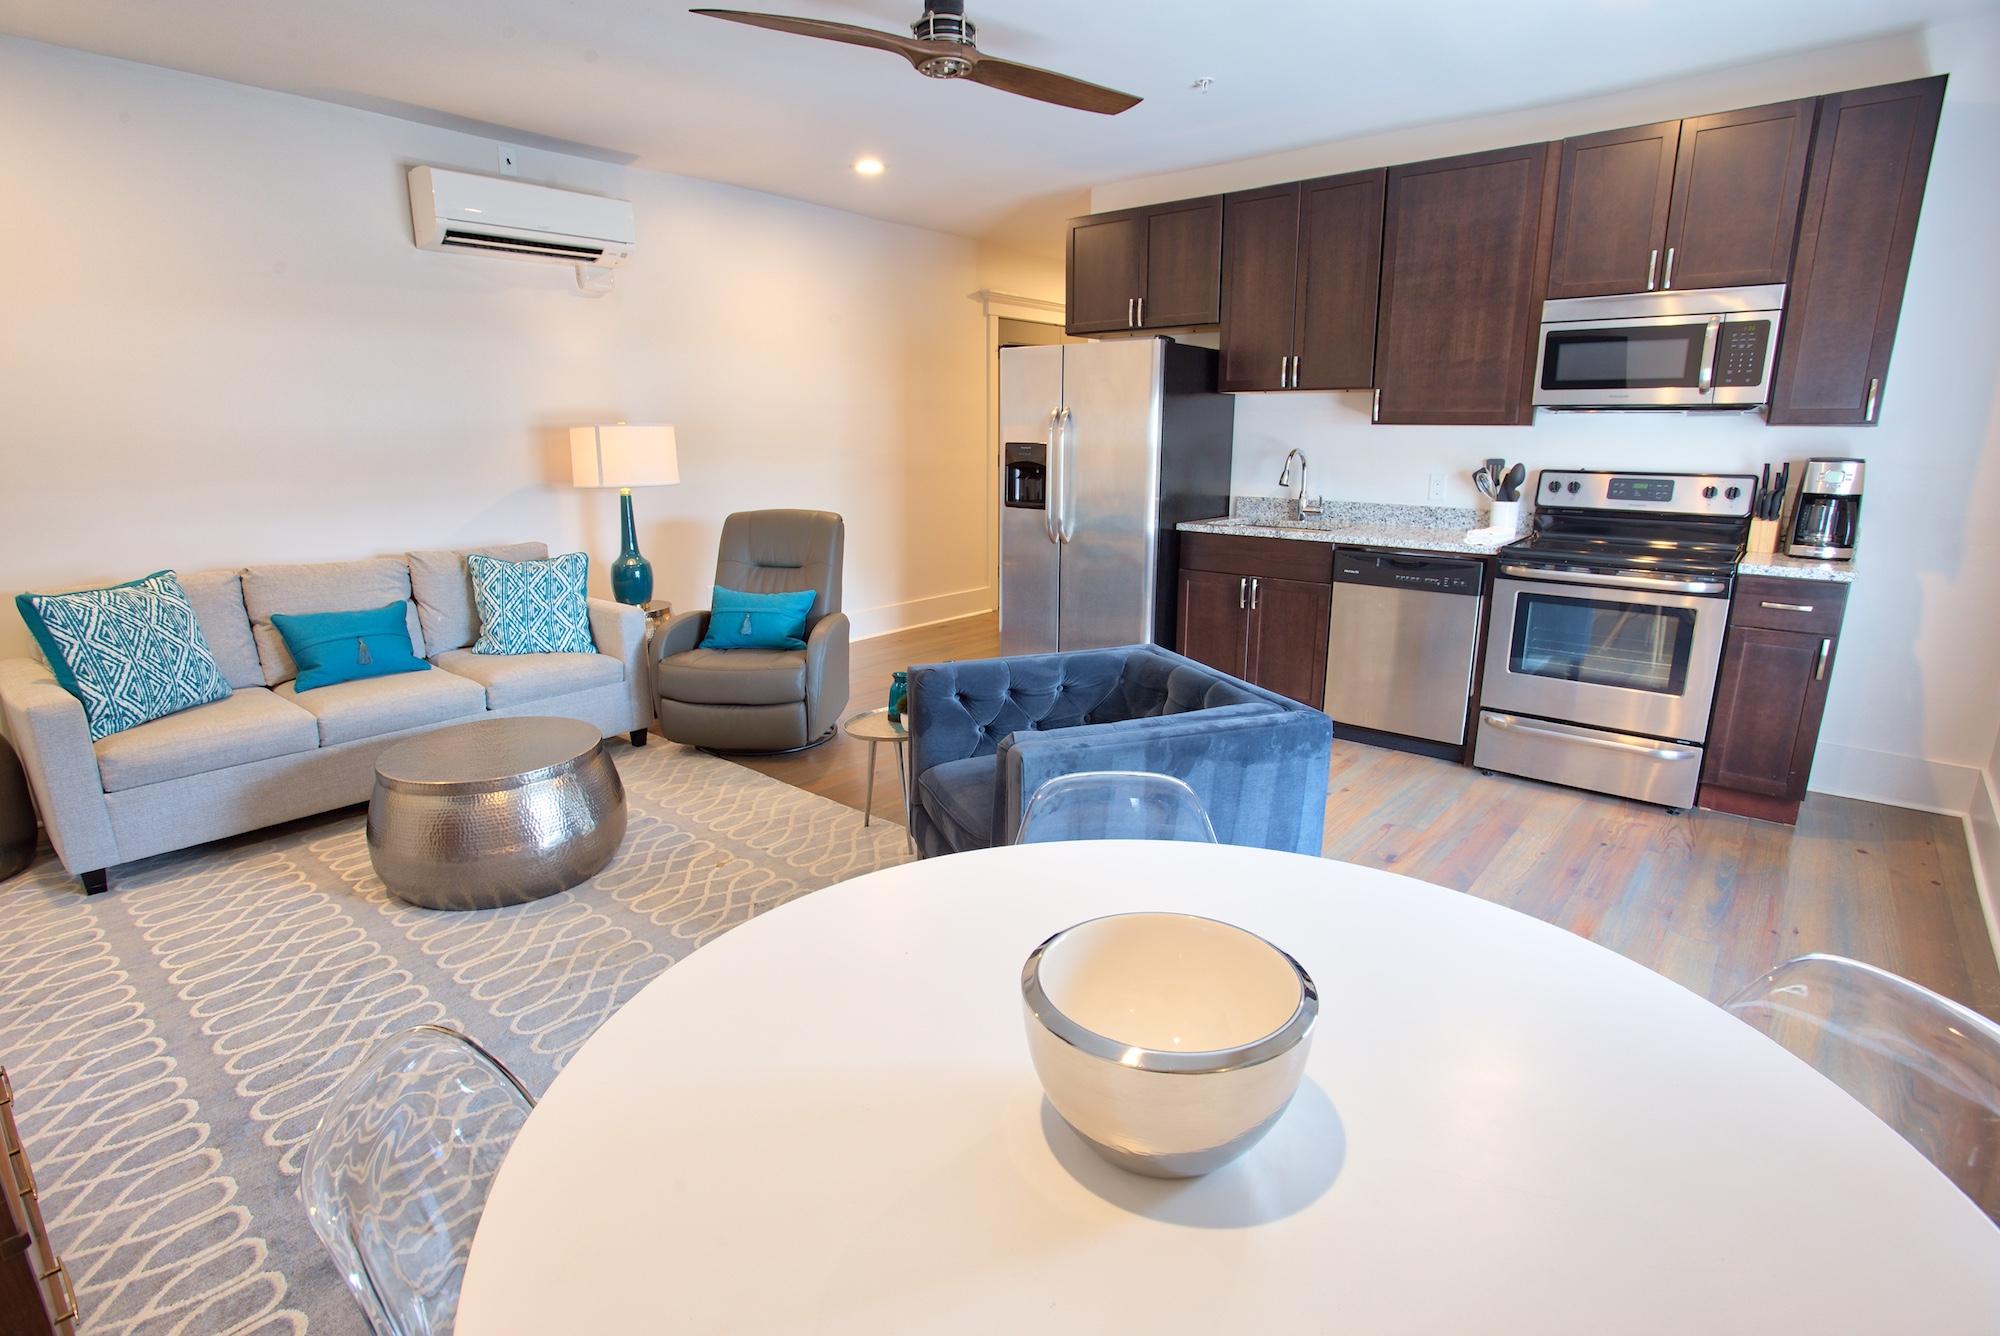 Suite on King Street Charleston SC Vacation Rental The Gullah Suite22.jpeg